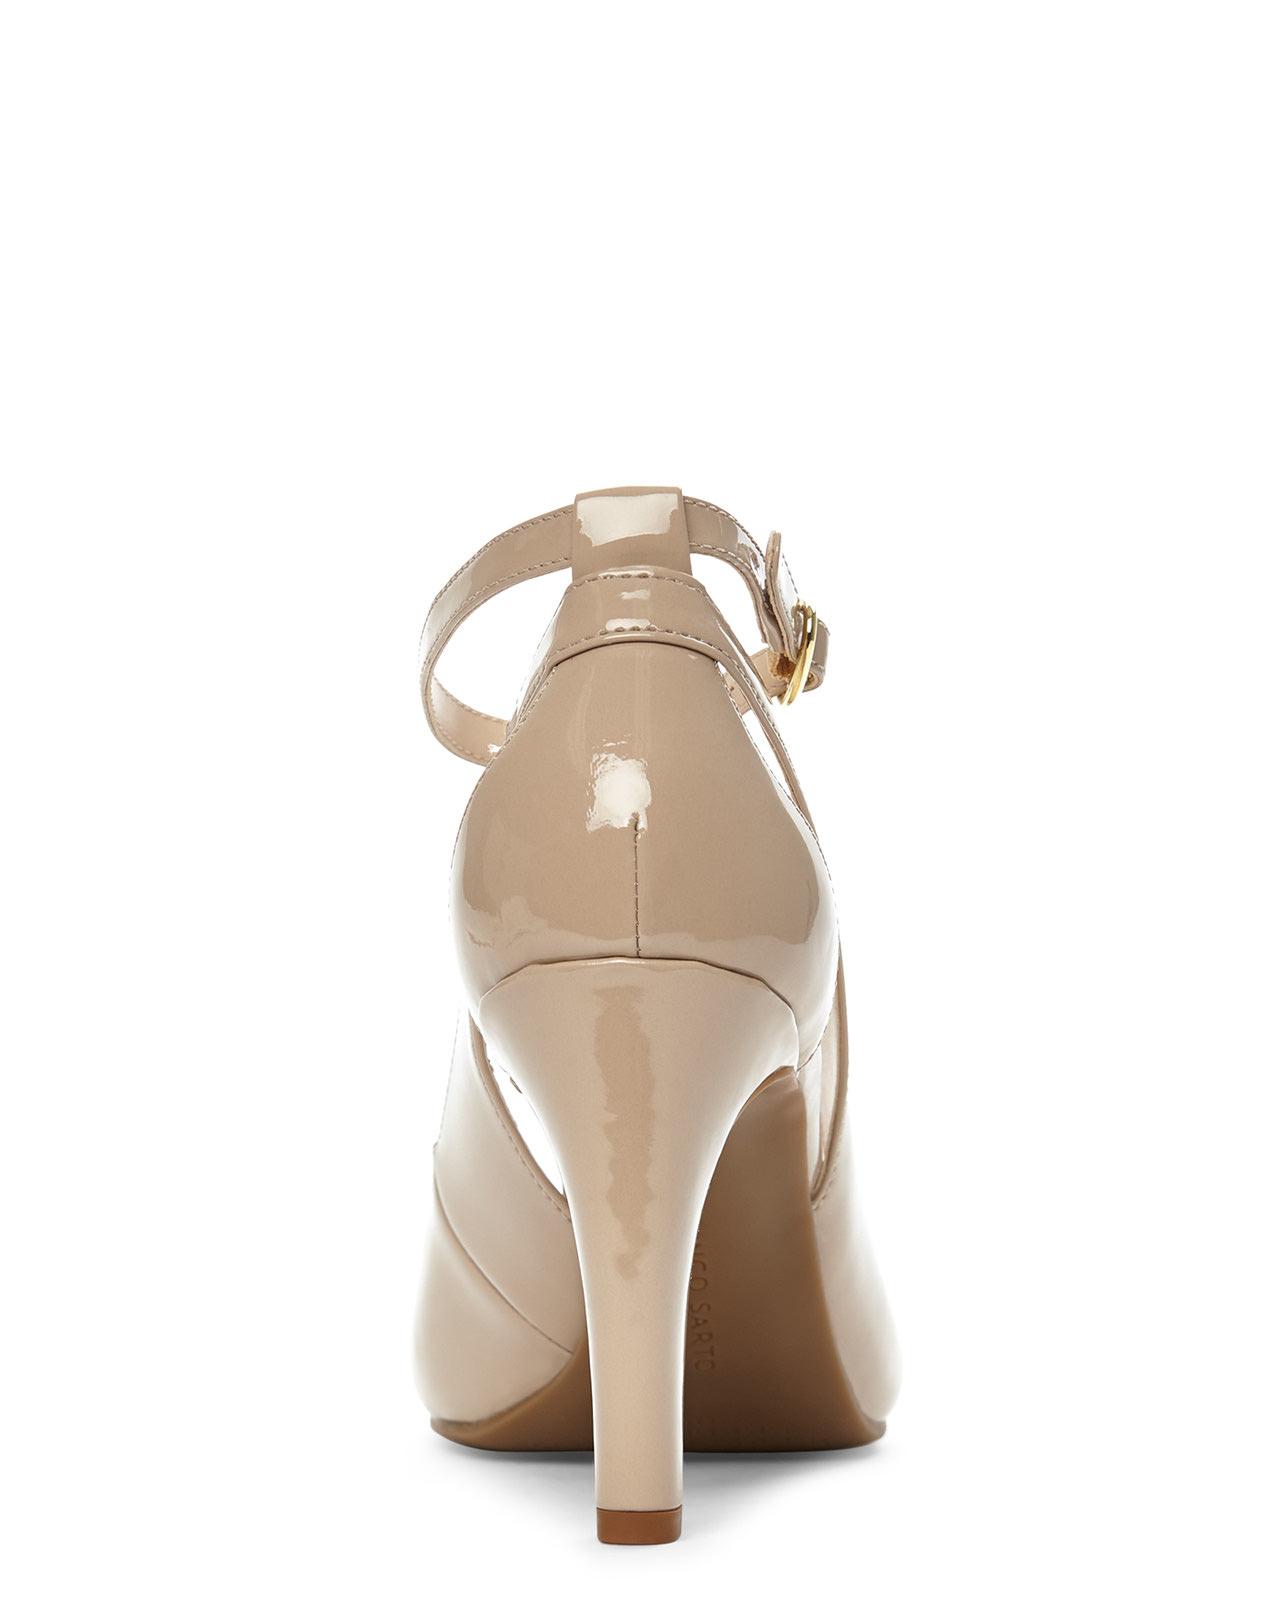 b90821db4a1b Lyst - Franco Sarto Nude Emmy Peep Toe Pumps in Natural